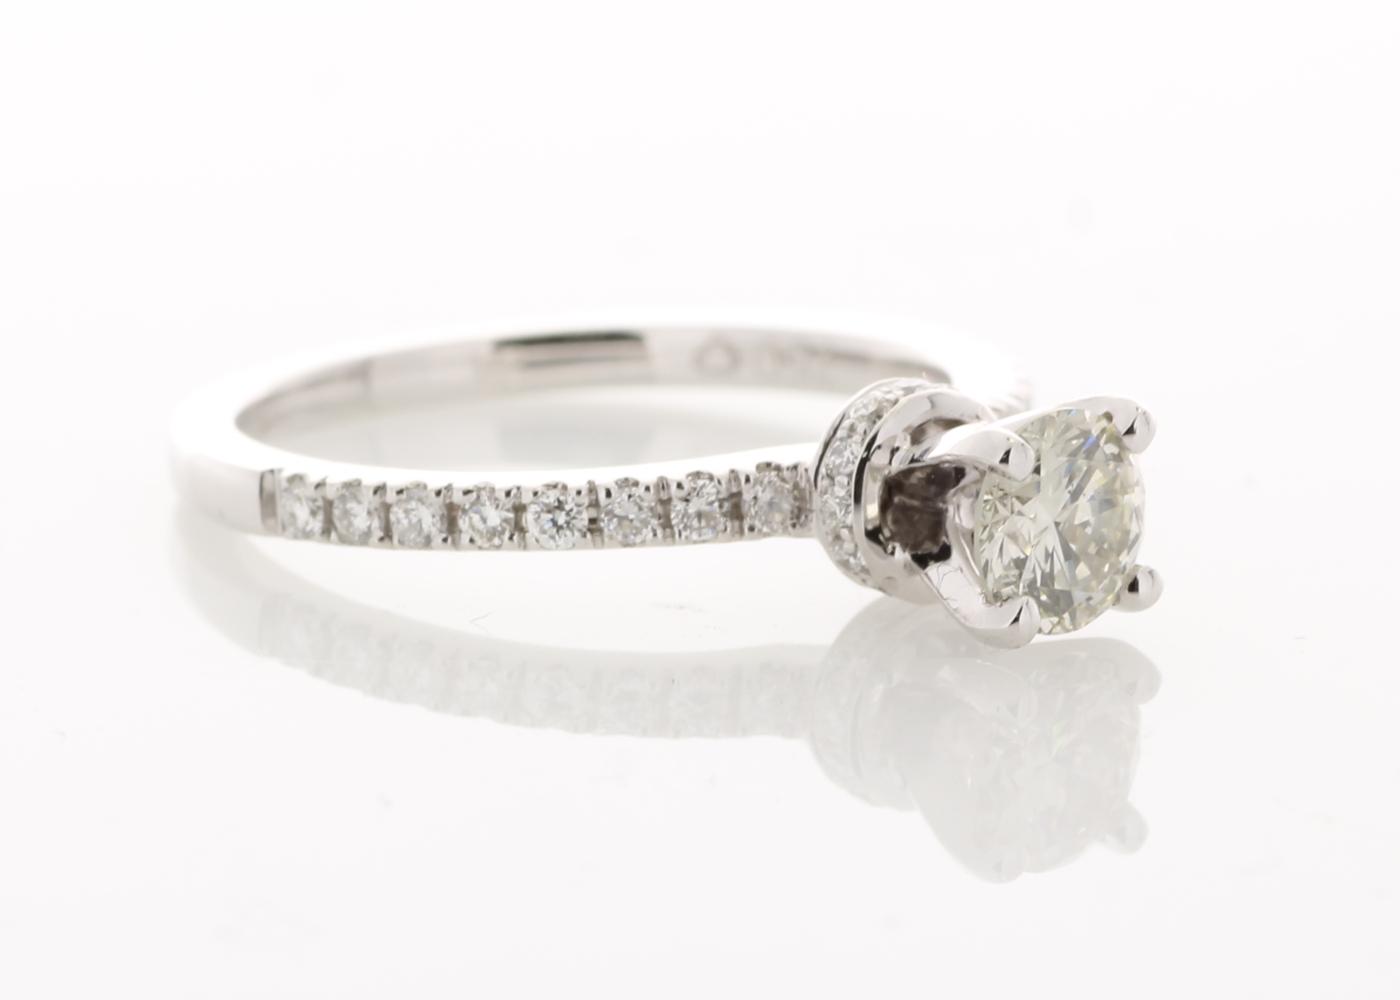 Lot 21 - 18ct White Gold Diamond Ring 0.73 Carats